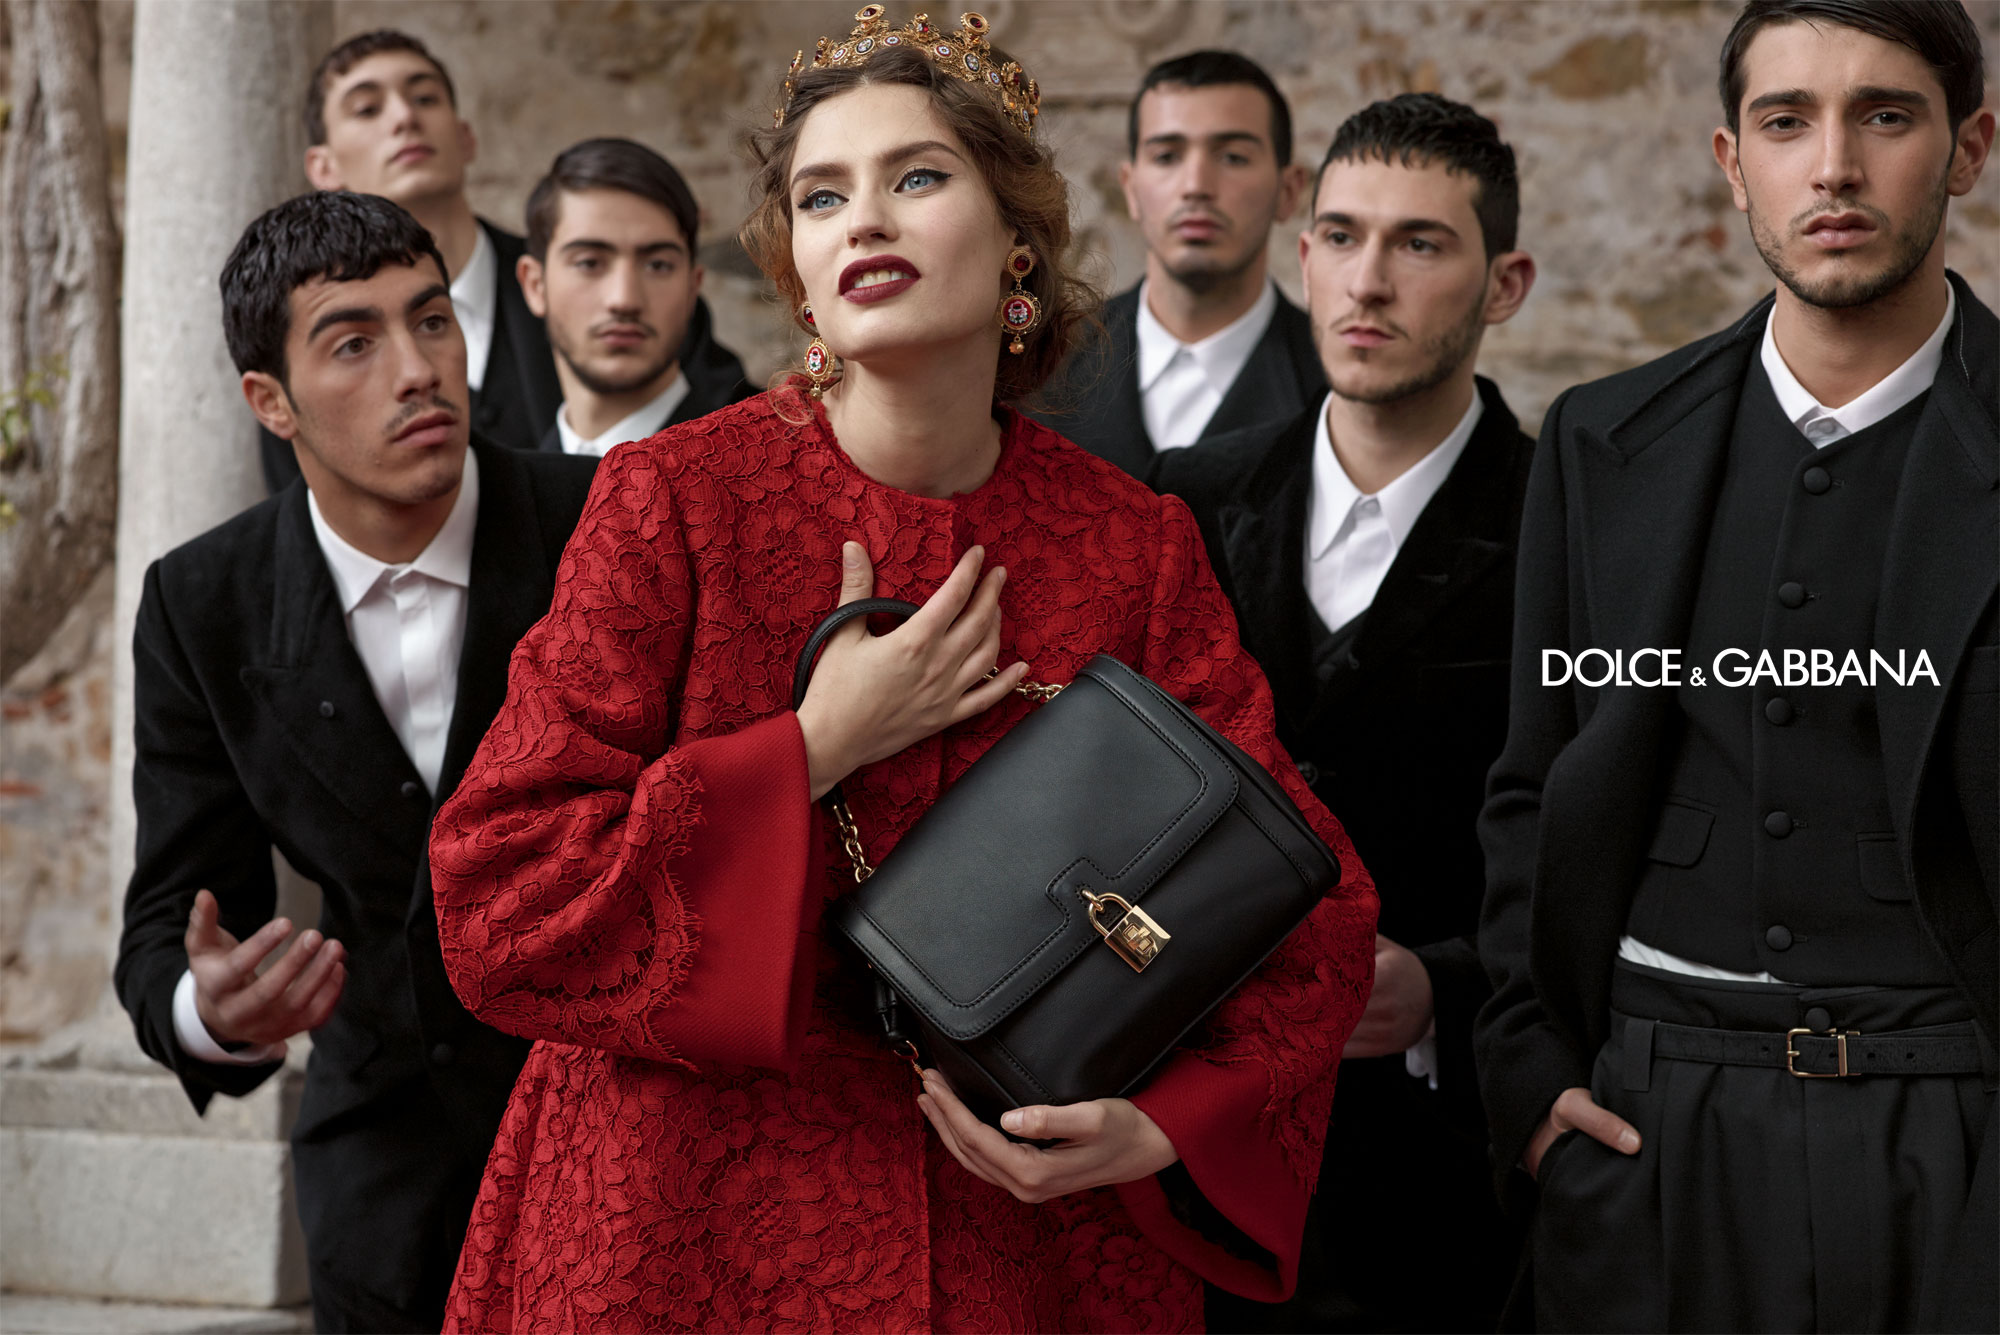 dolce-and-gabbana-fw-2014-women-adv-campaign-12